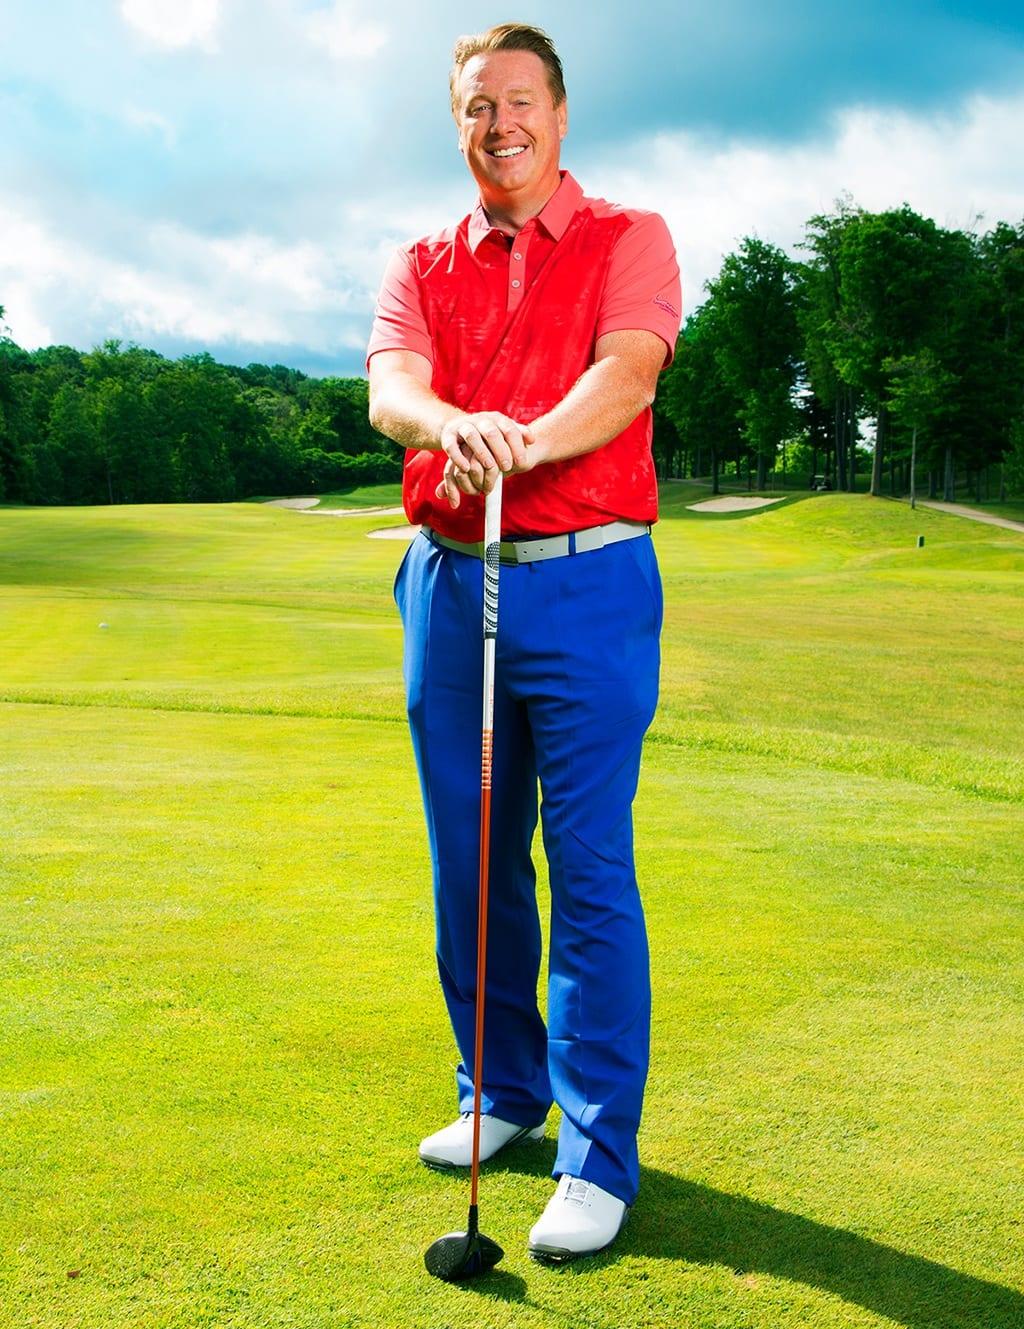 Jimmy Hanlin PGA Professional Golfer